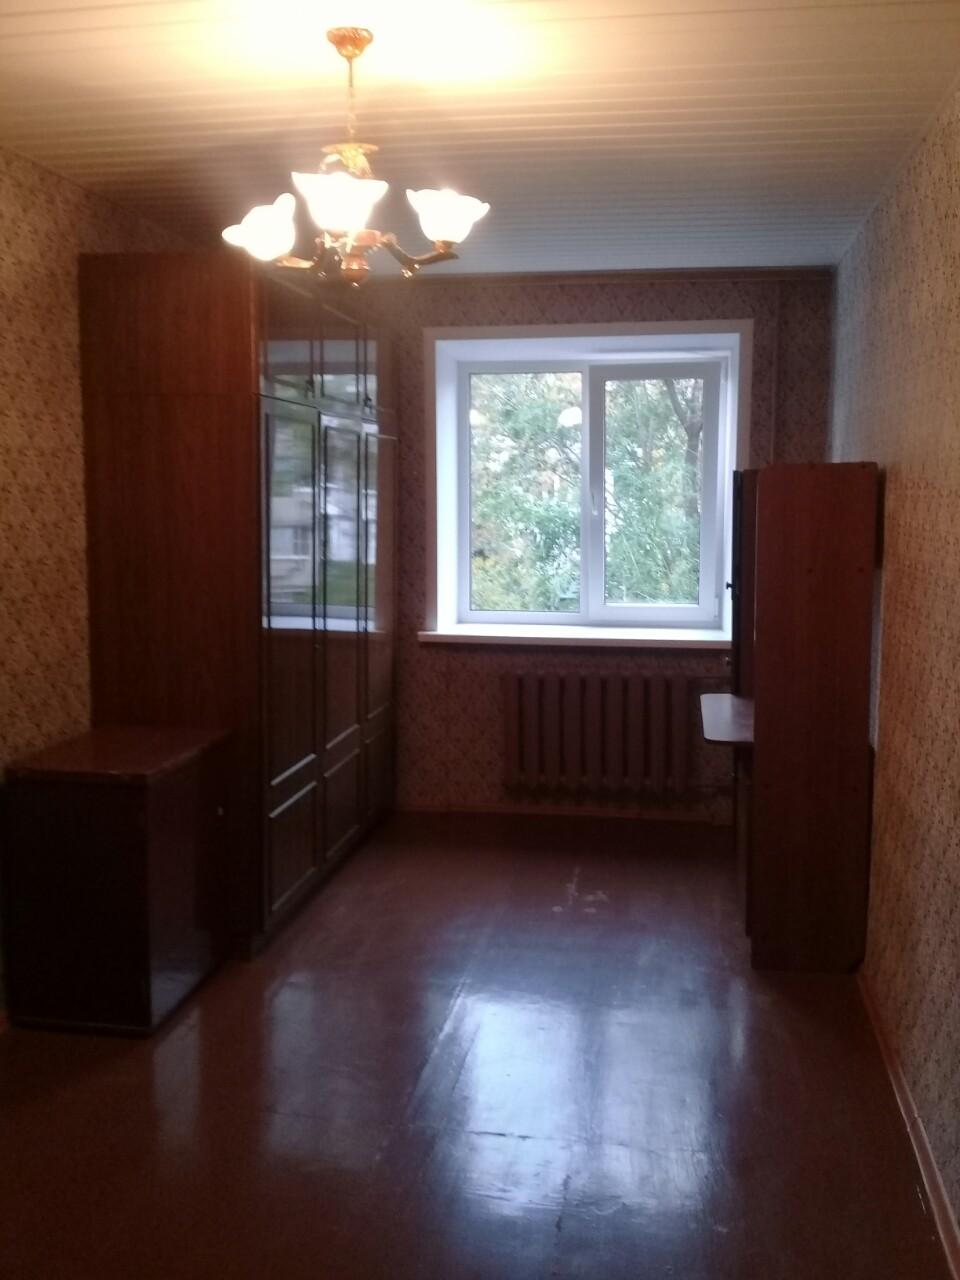 Аренда 2-комнатной квартиры, г. Тольятти, Горького улица  дом 55